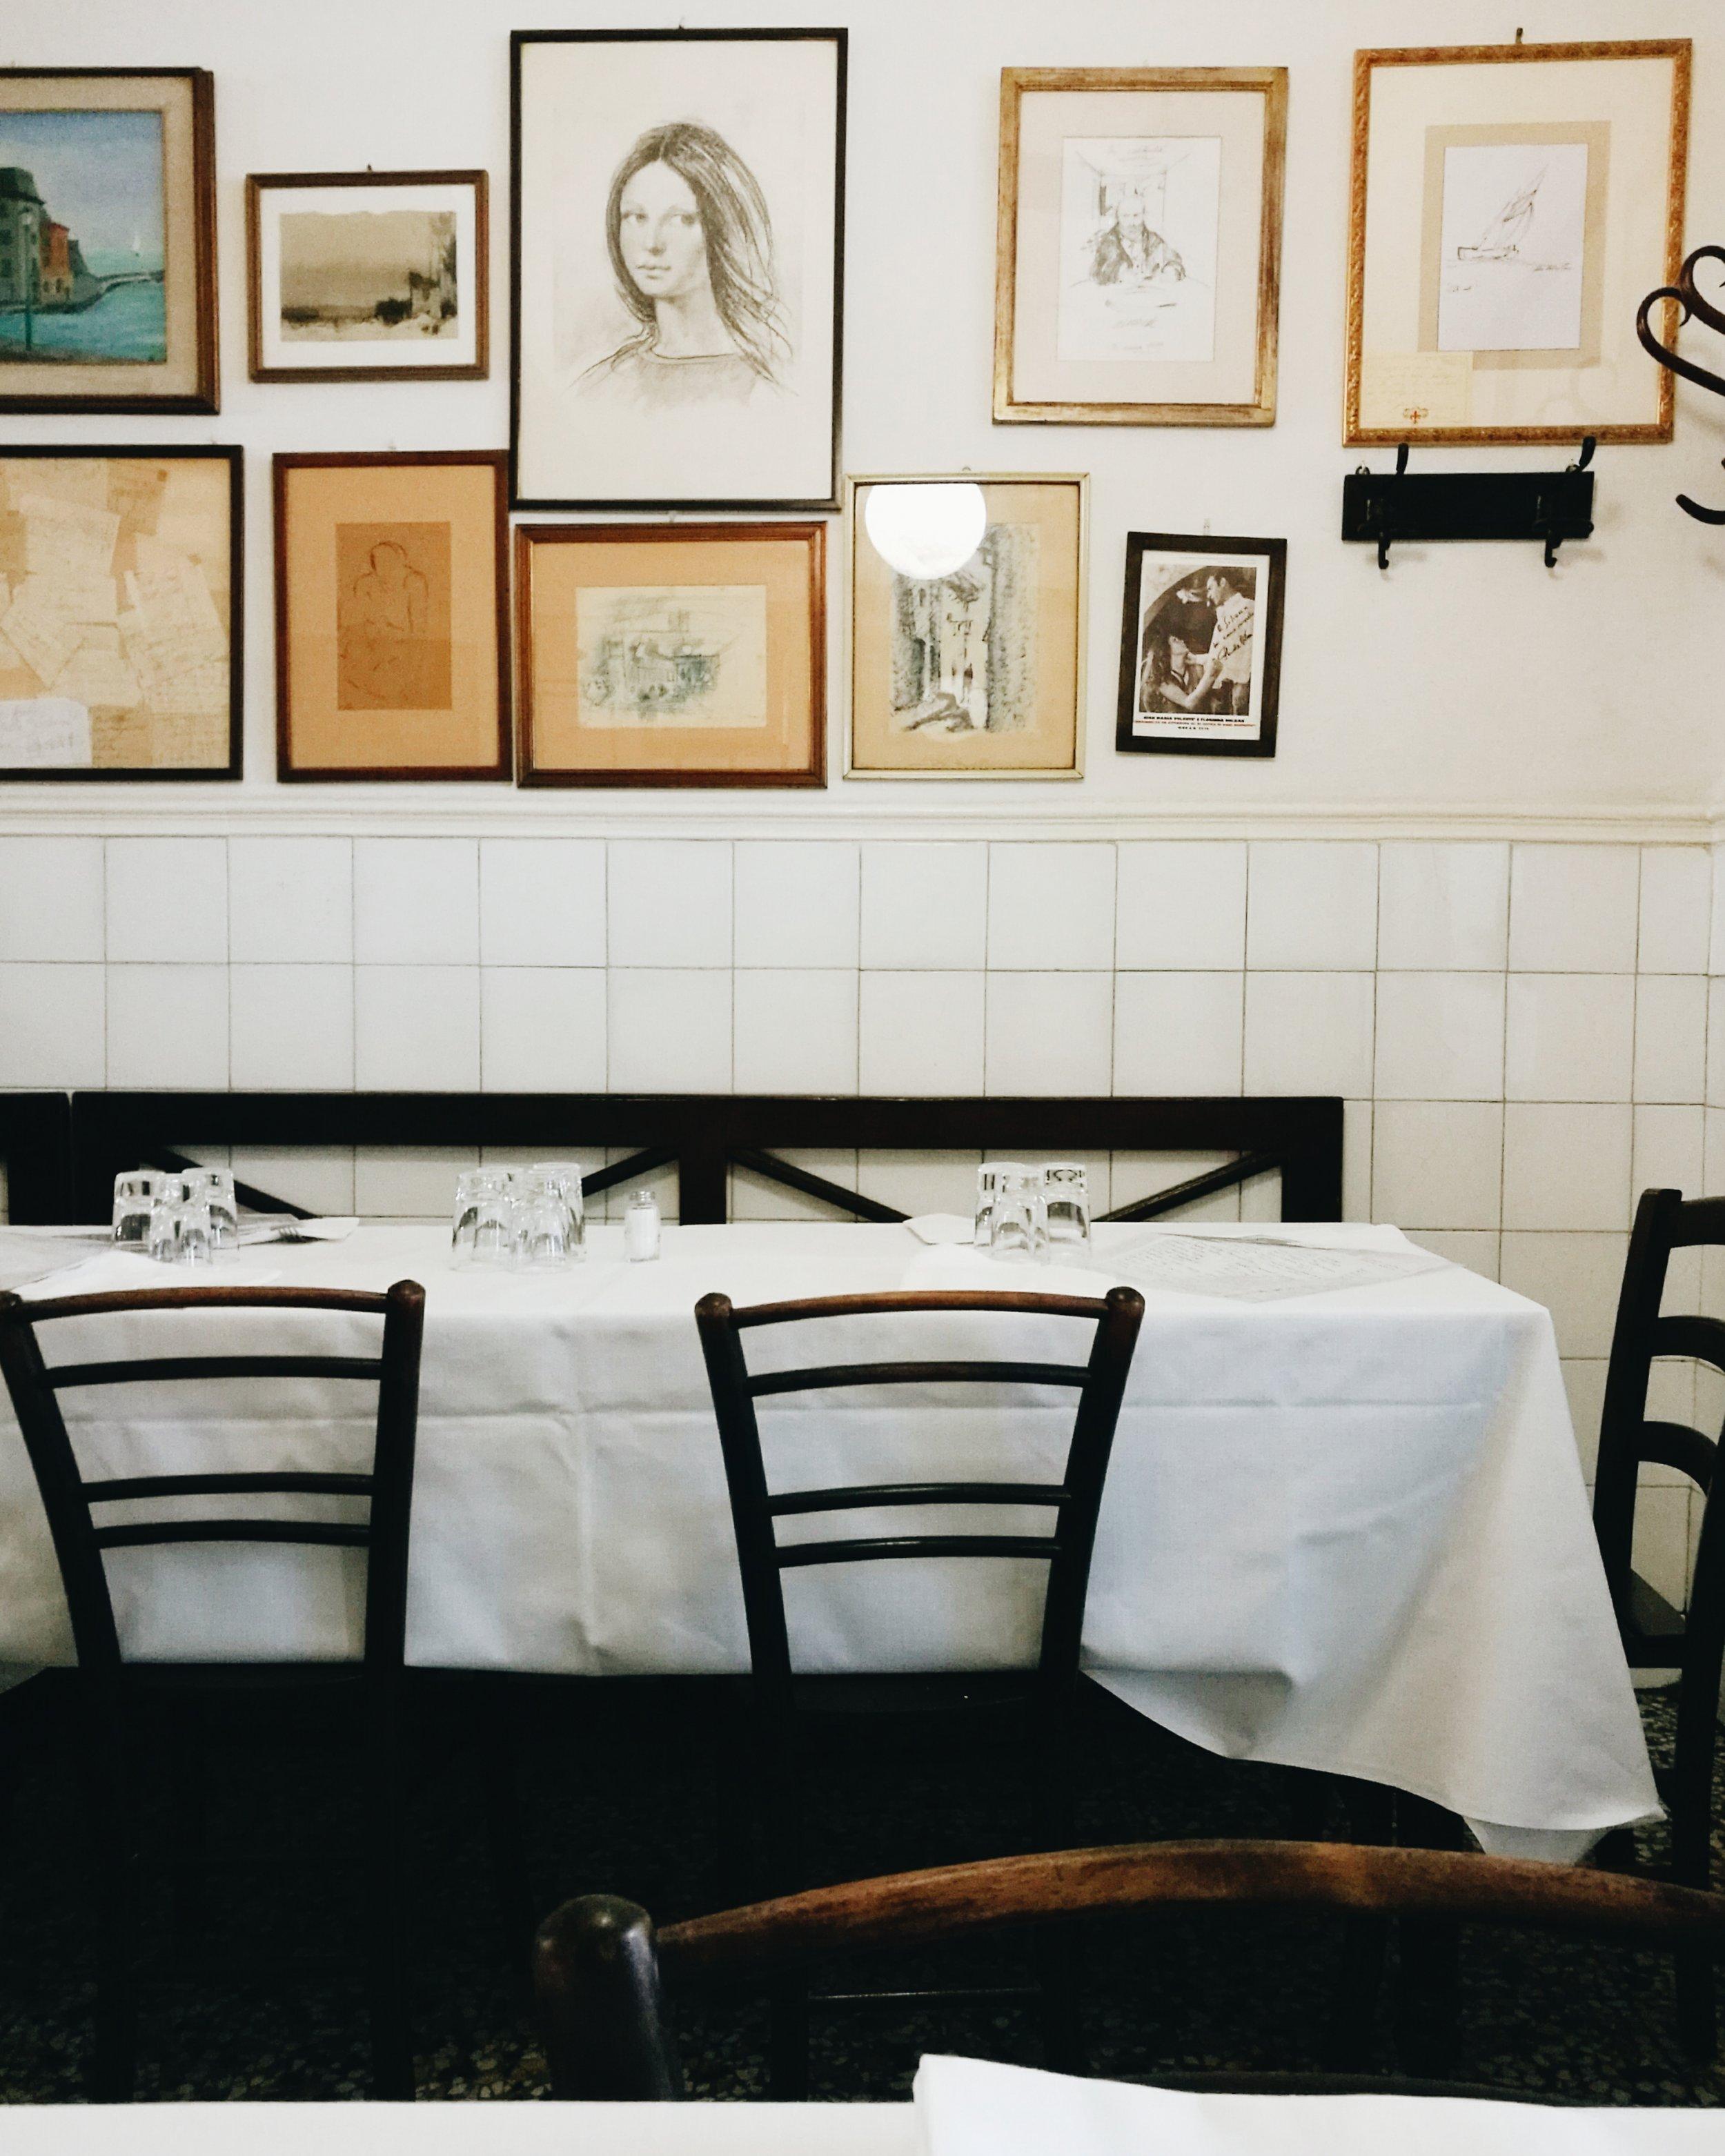 Trattoria Sostanza tables photo credit Emiko Davies